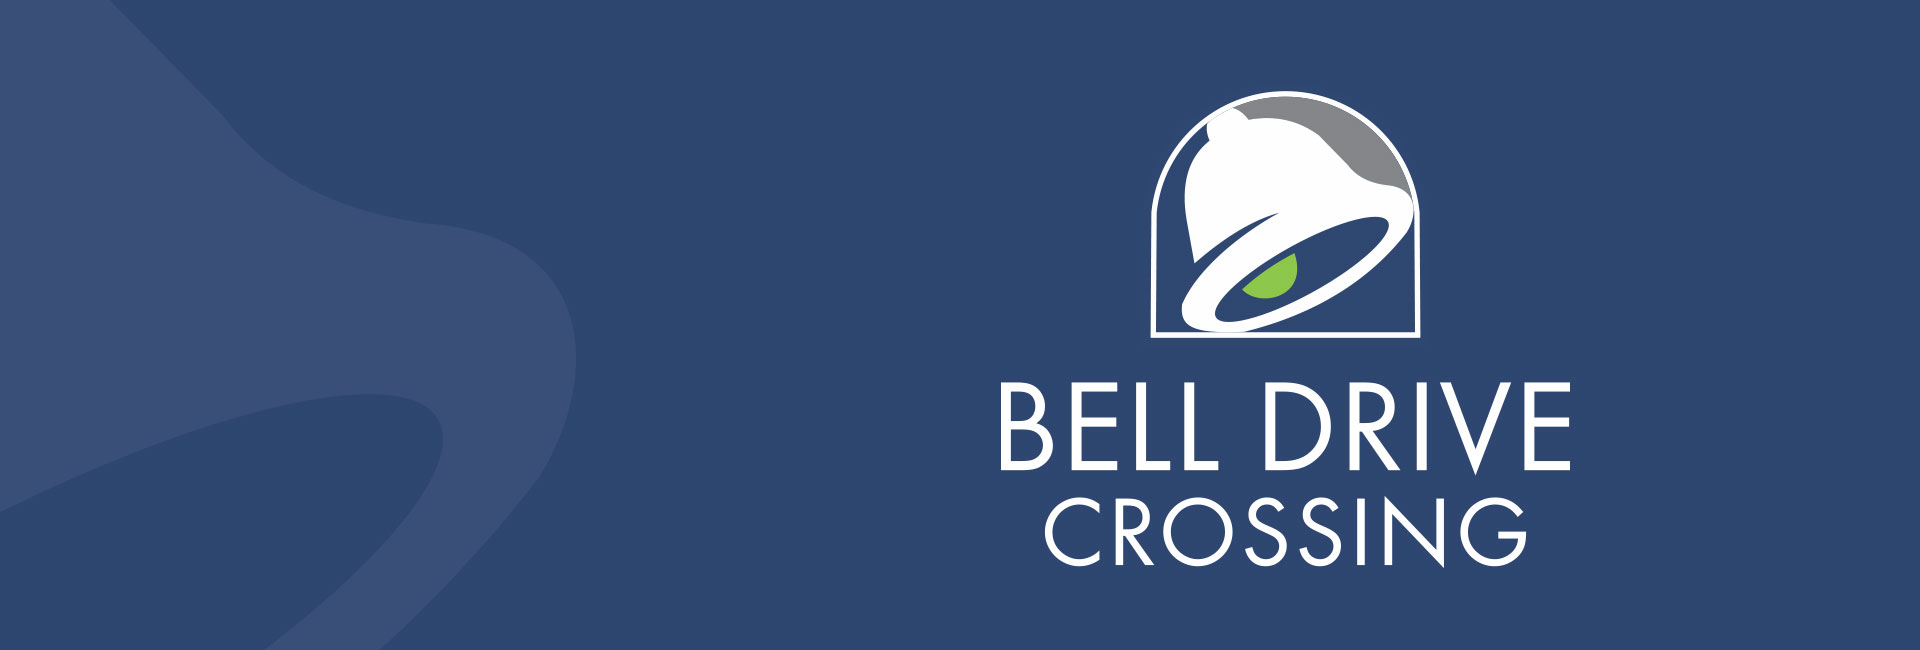 bell-drive-logo